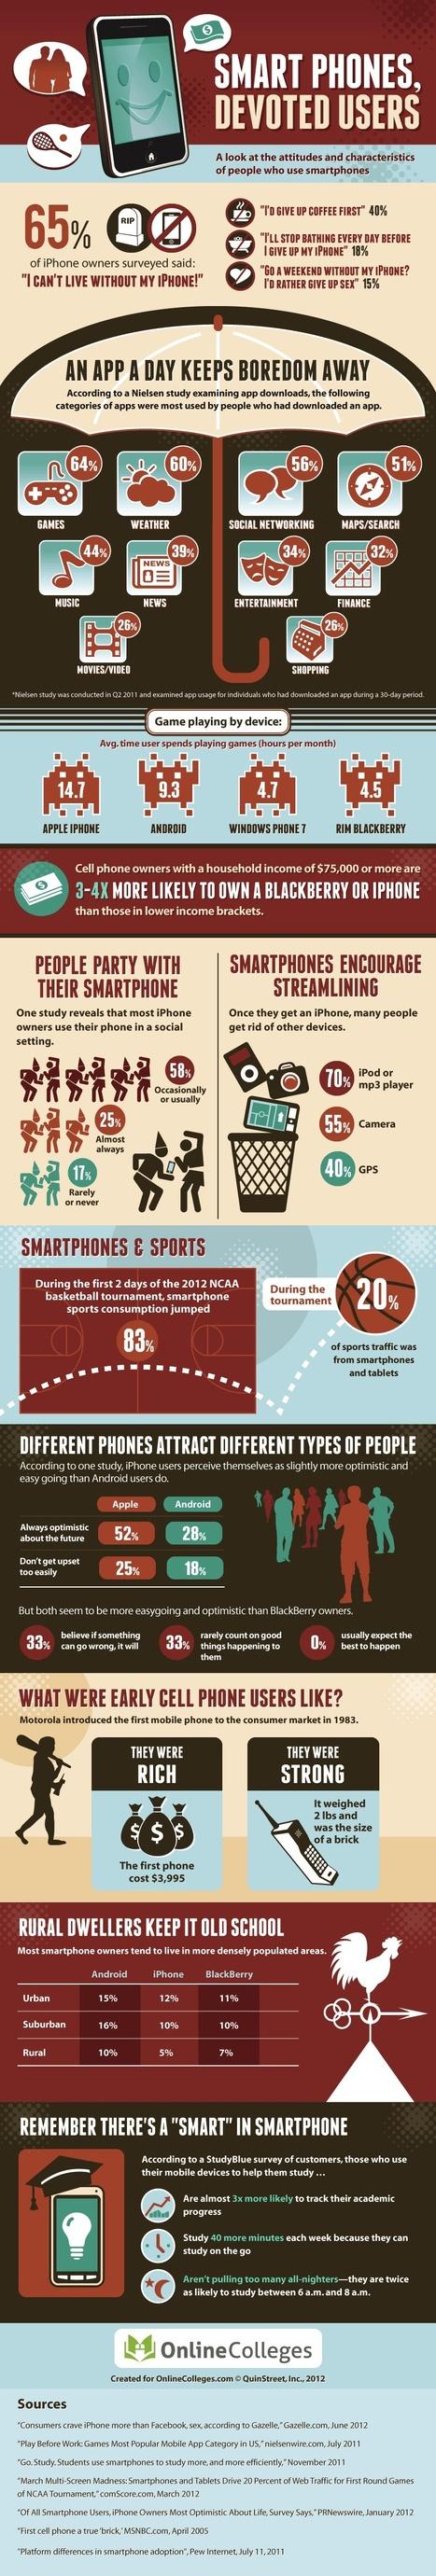 Are You Addicted to Your Smartphone? [INFOGRAPHIC] | omnia mea mecum fero | Scoop.it